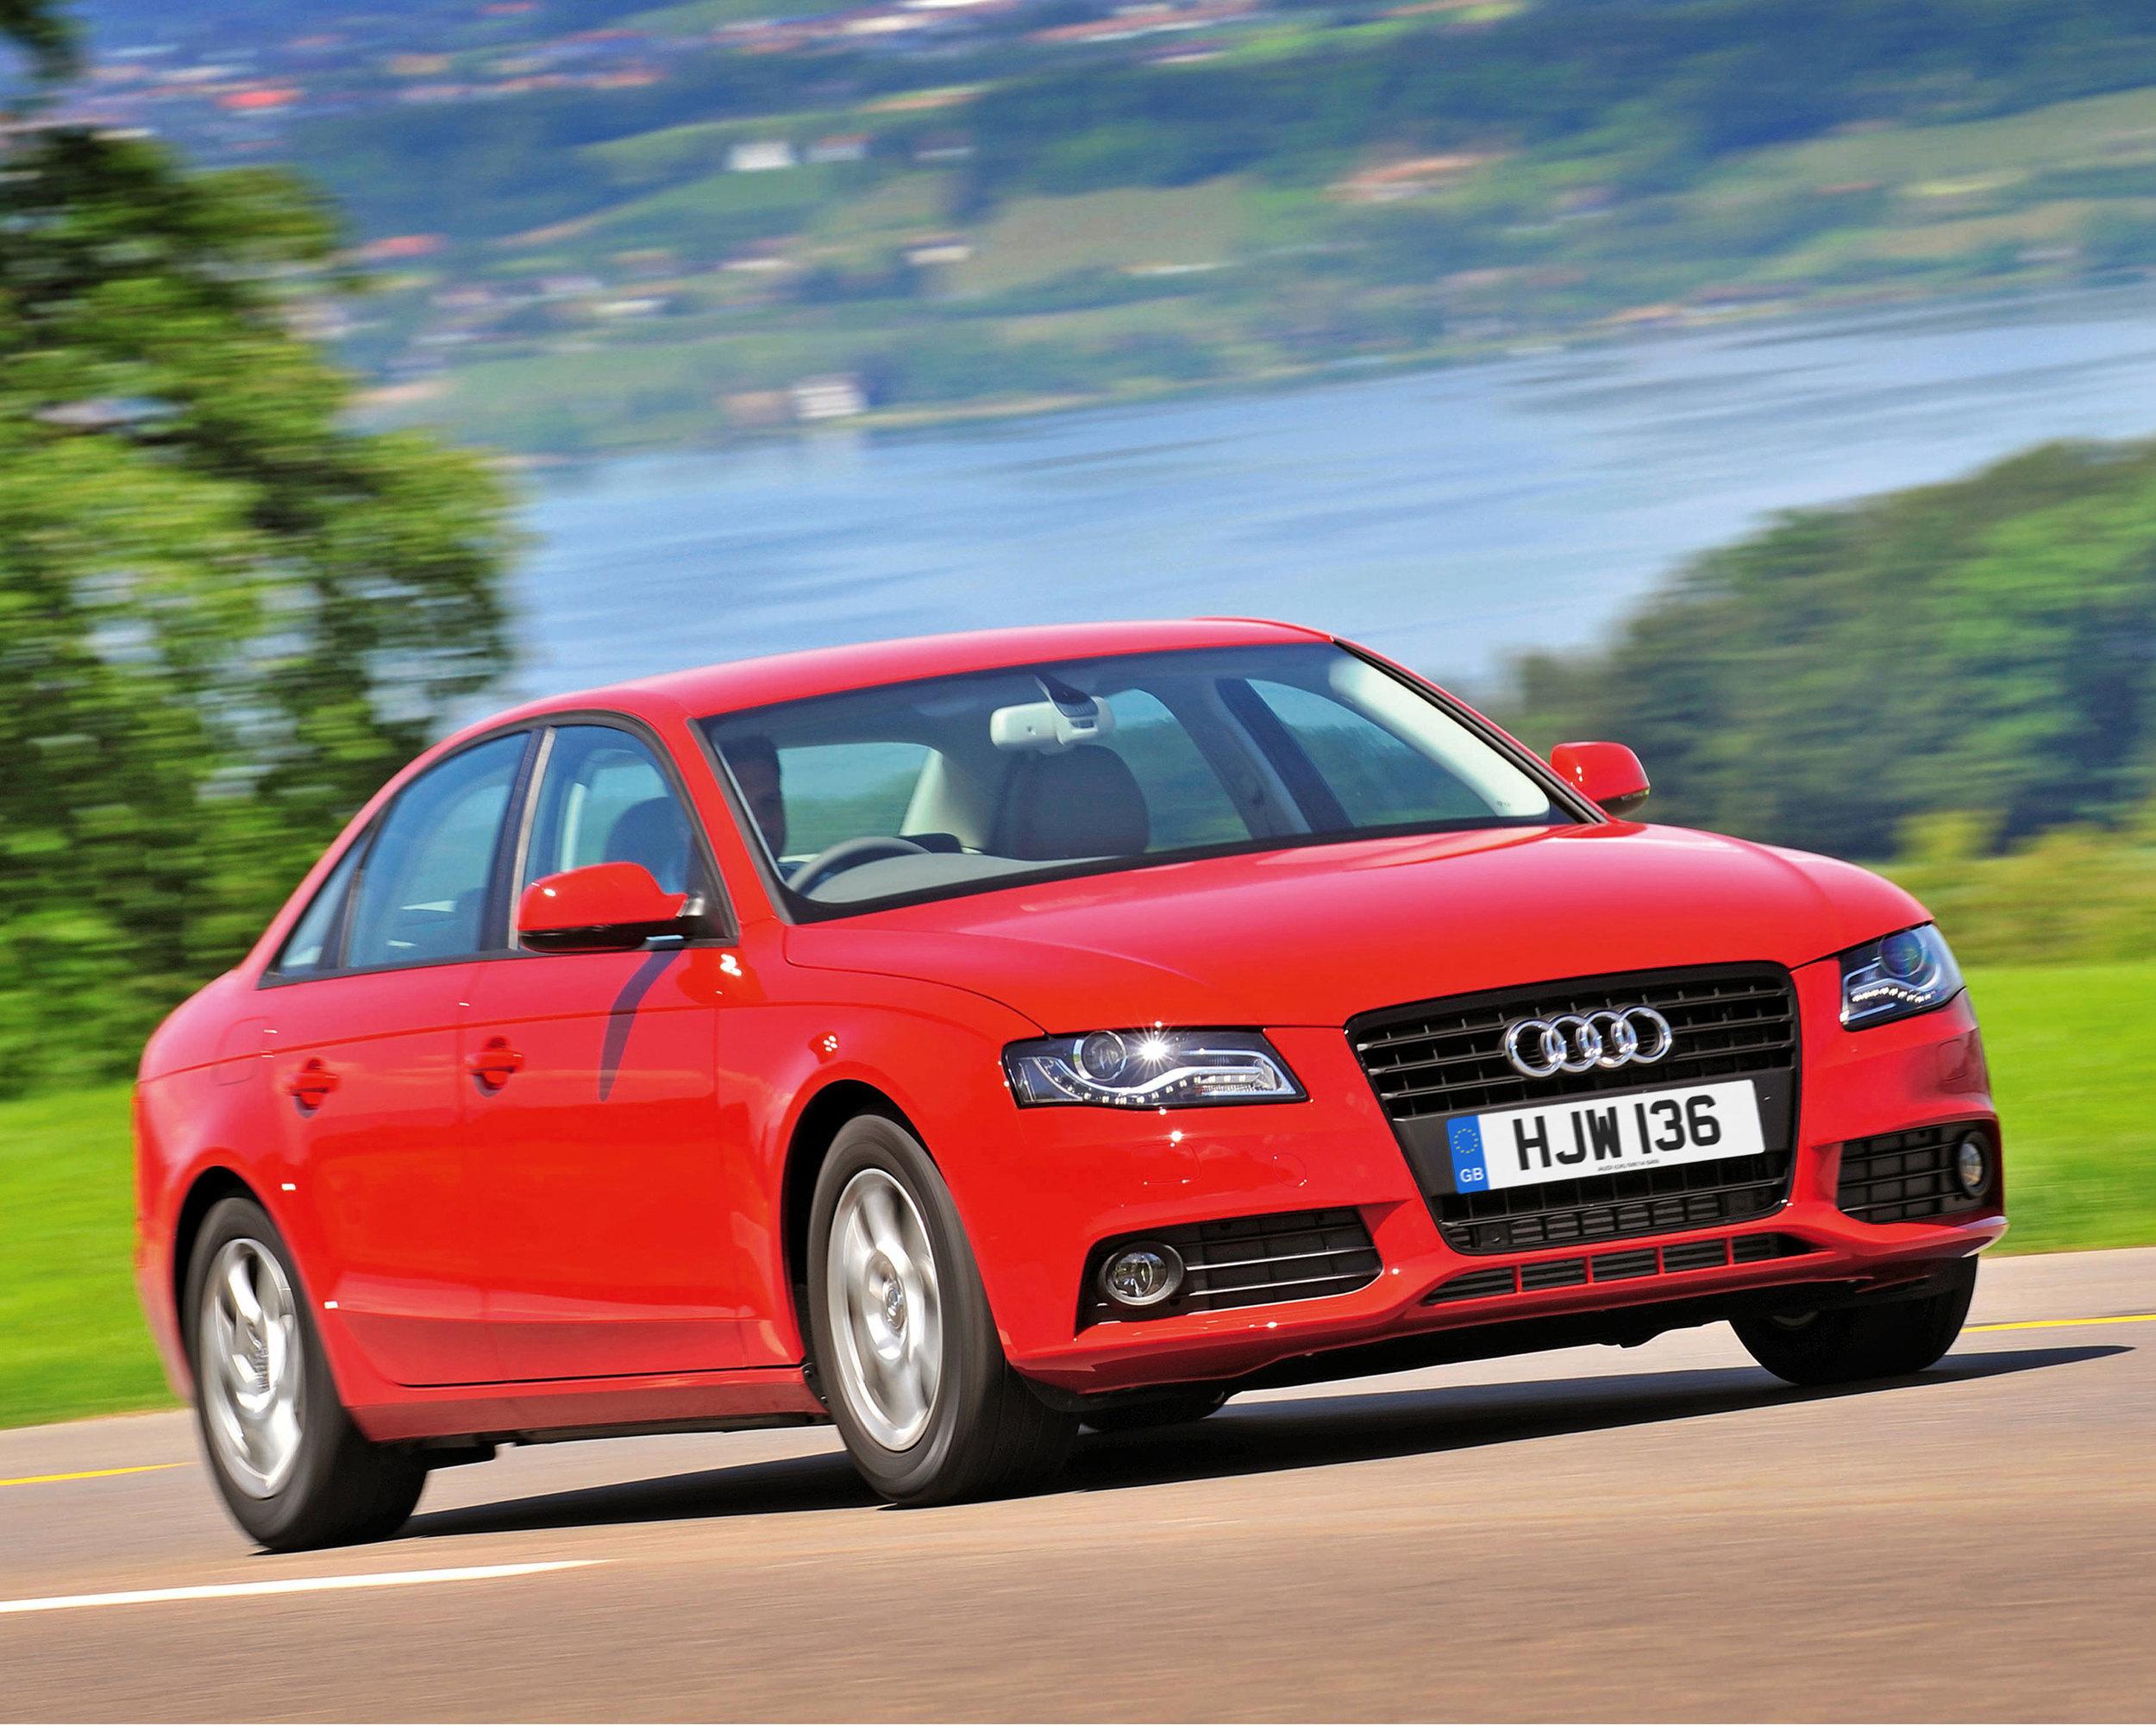 Audi A4 12.jpg